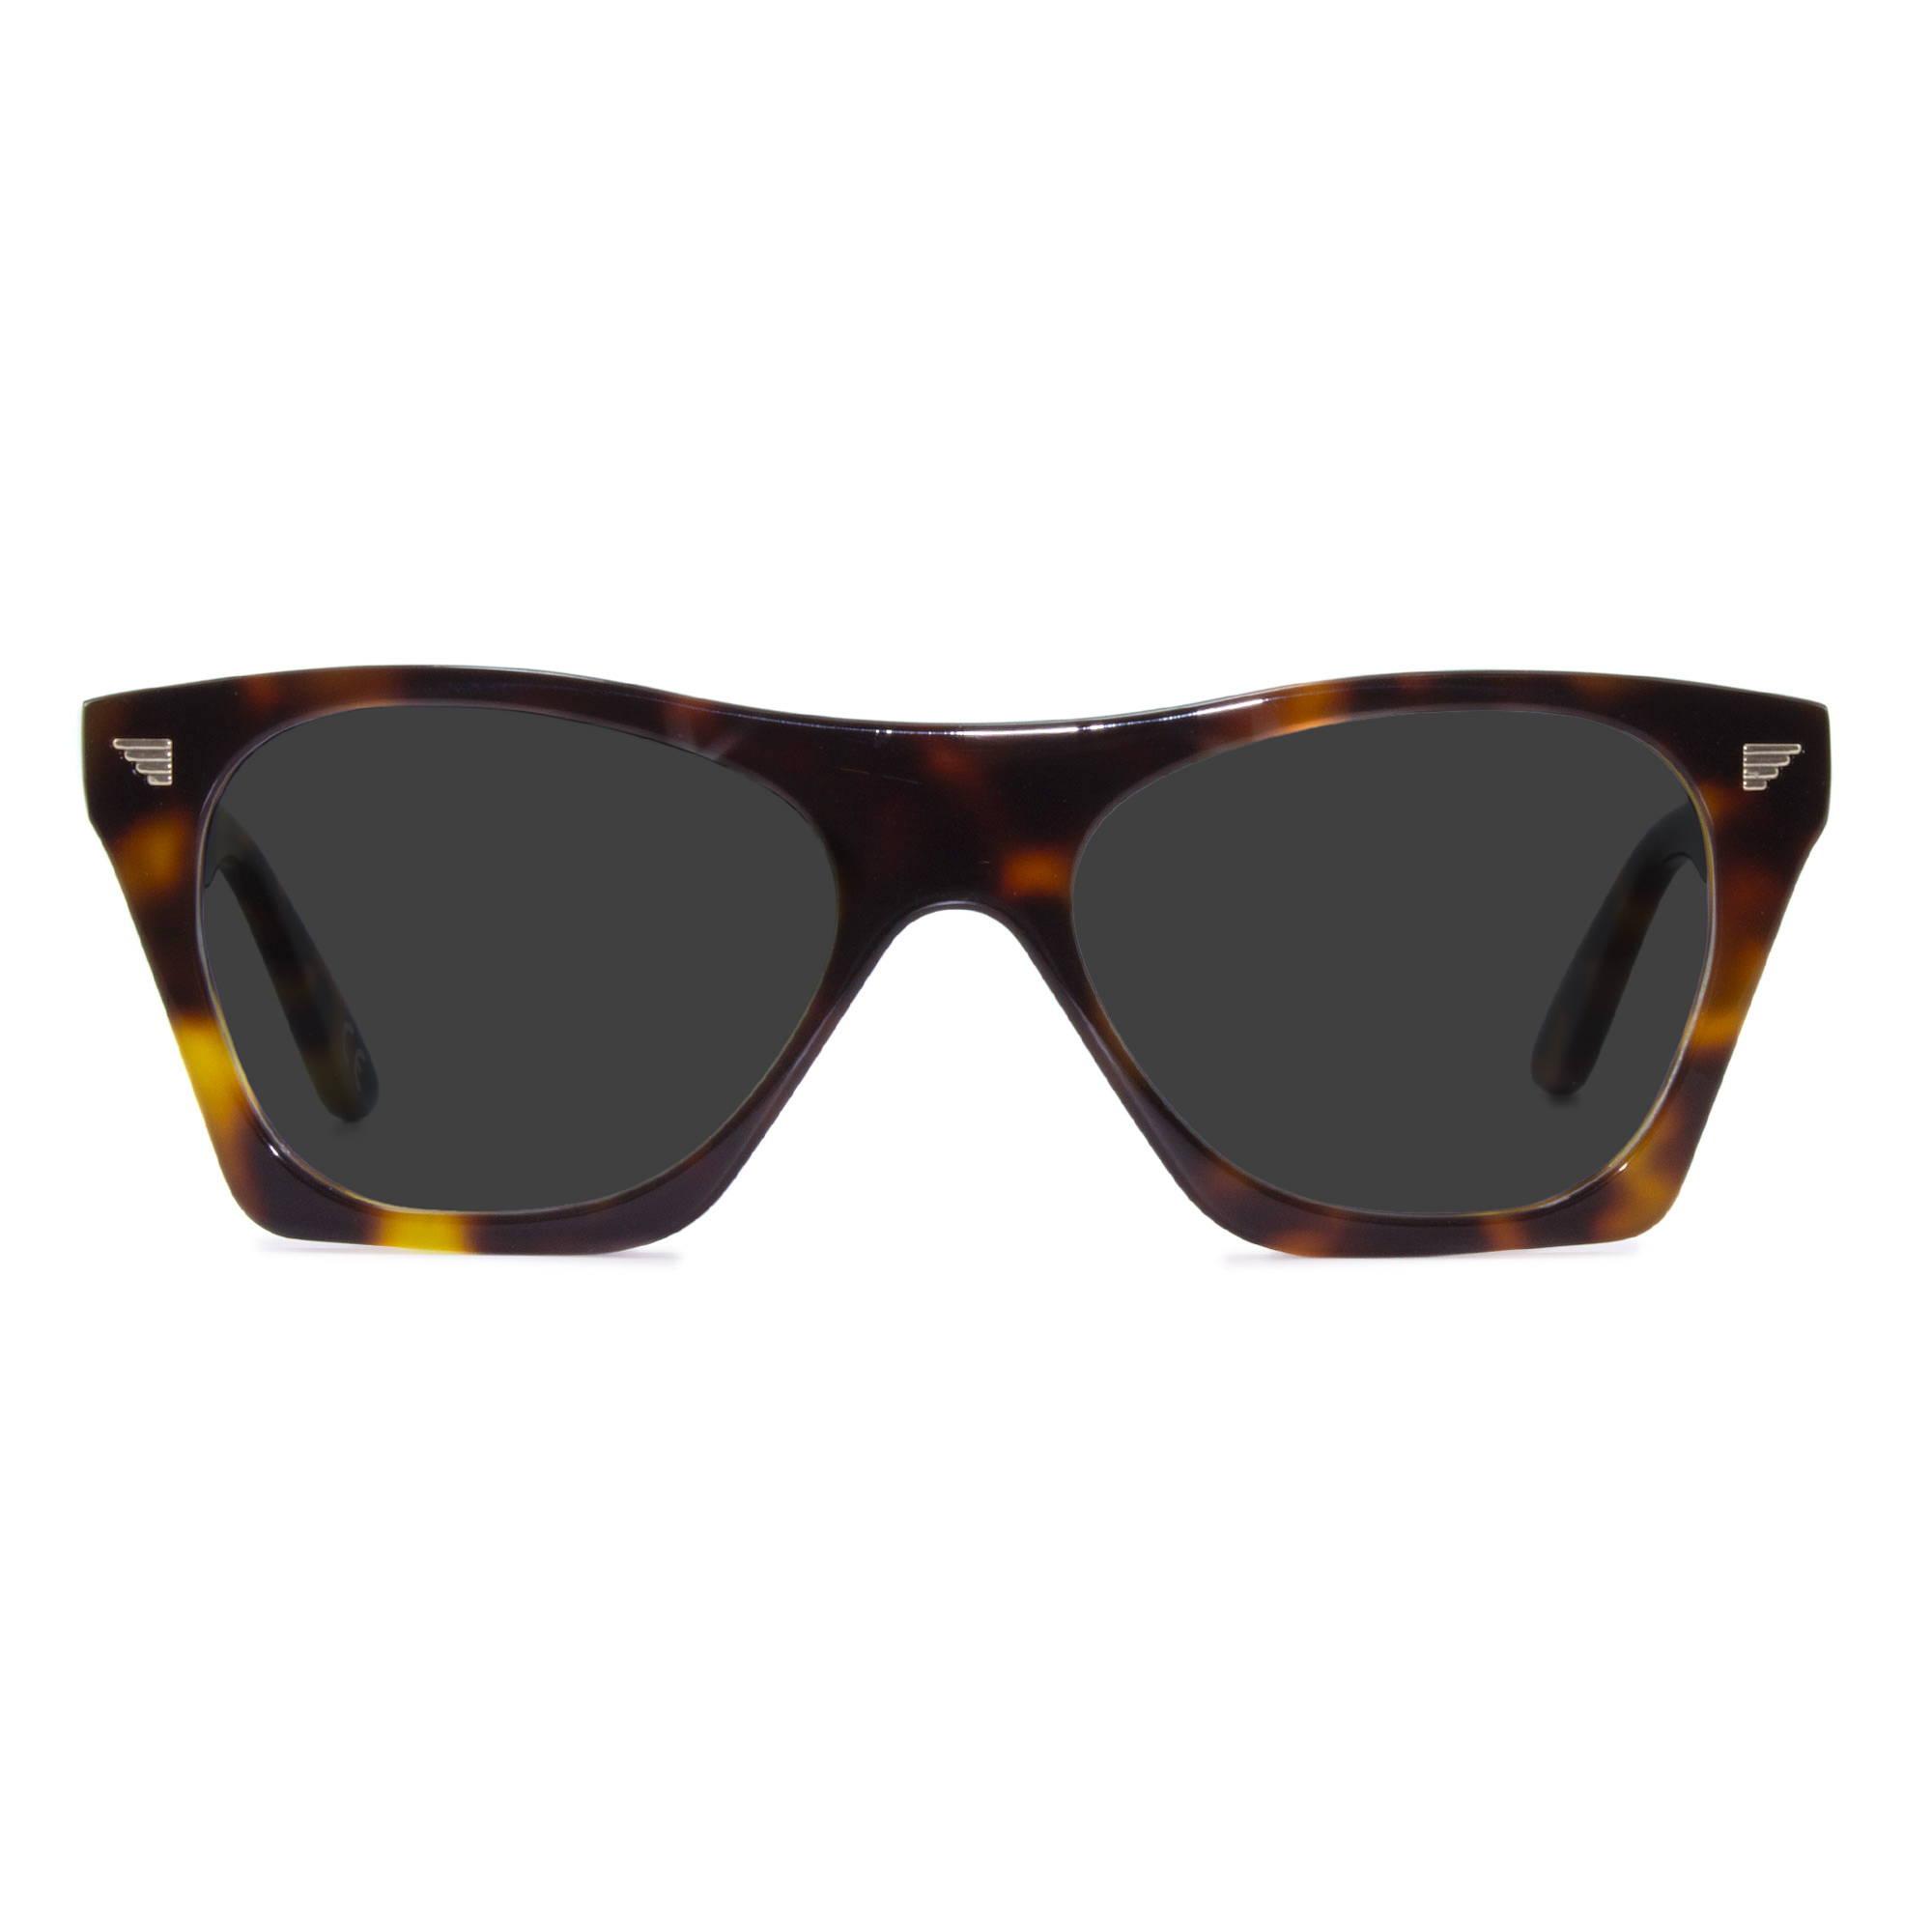 Joiuss oscar tortoiseshell sunglasses